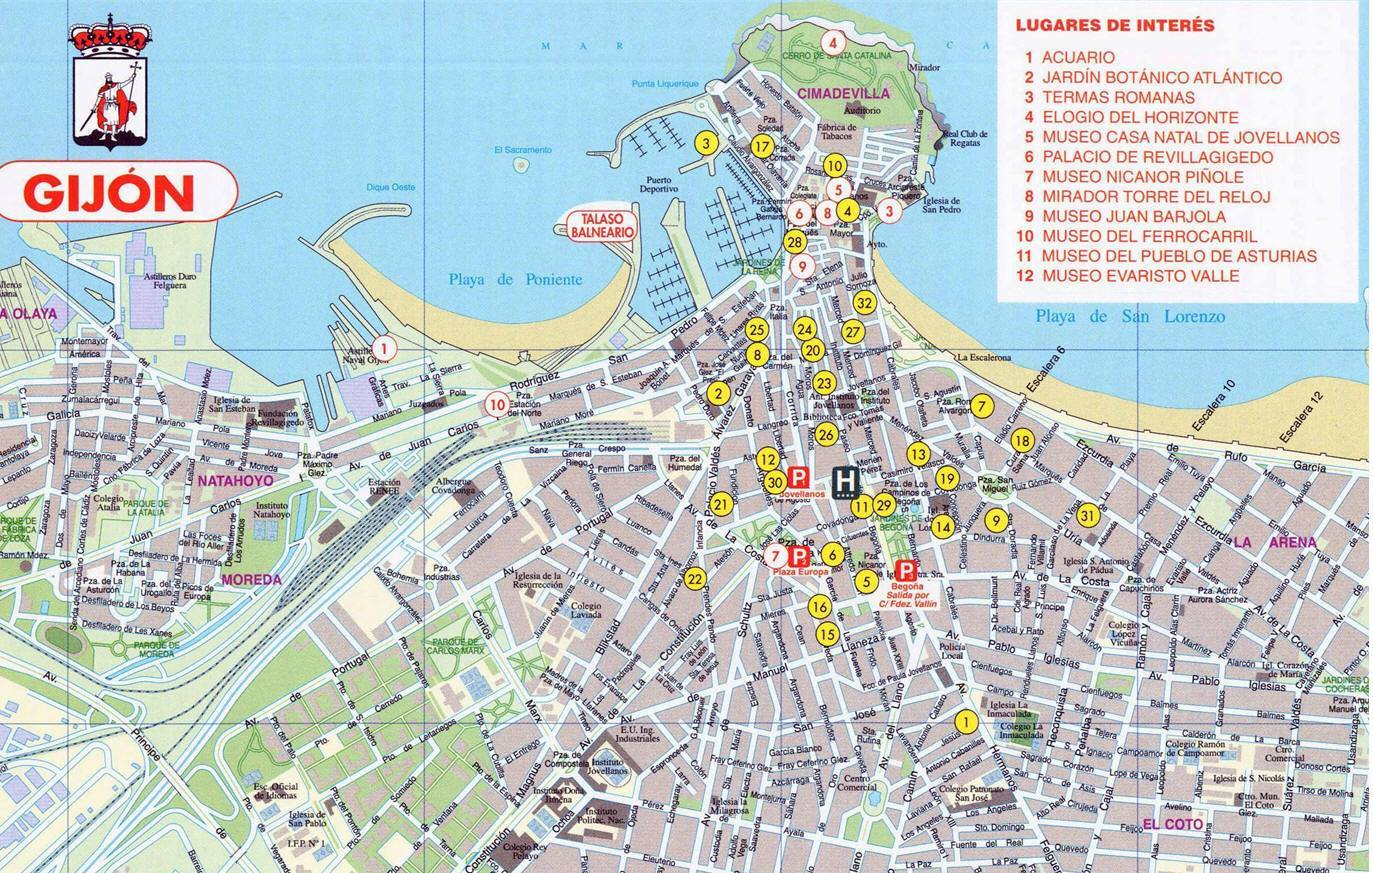 San Sebastian Spagna Cartina.Mappa Gijon Cartina Di Gijon